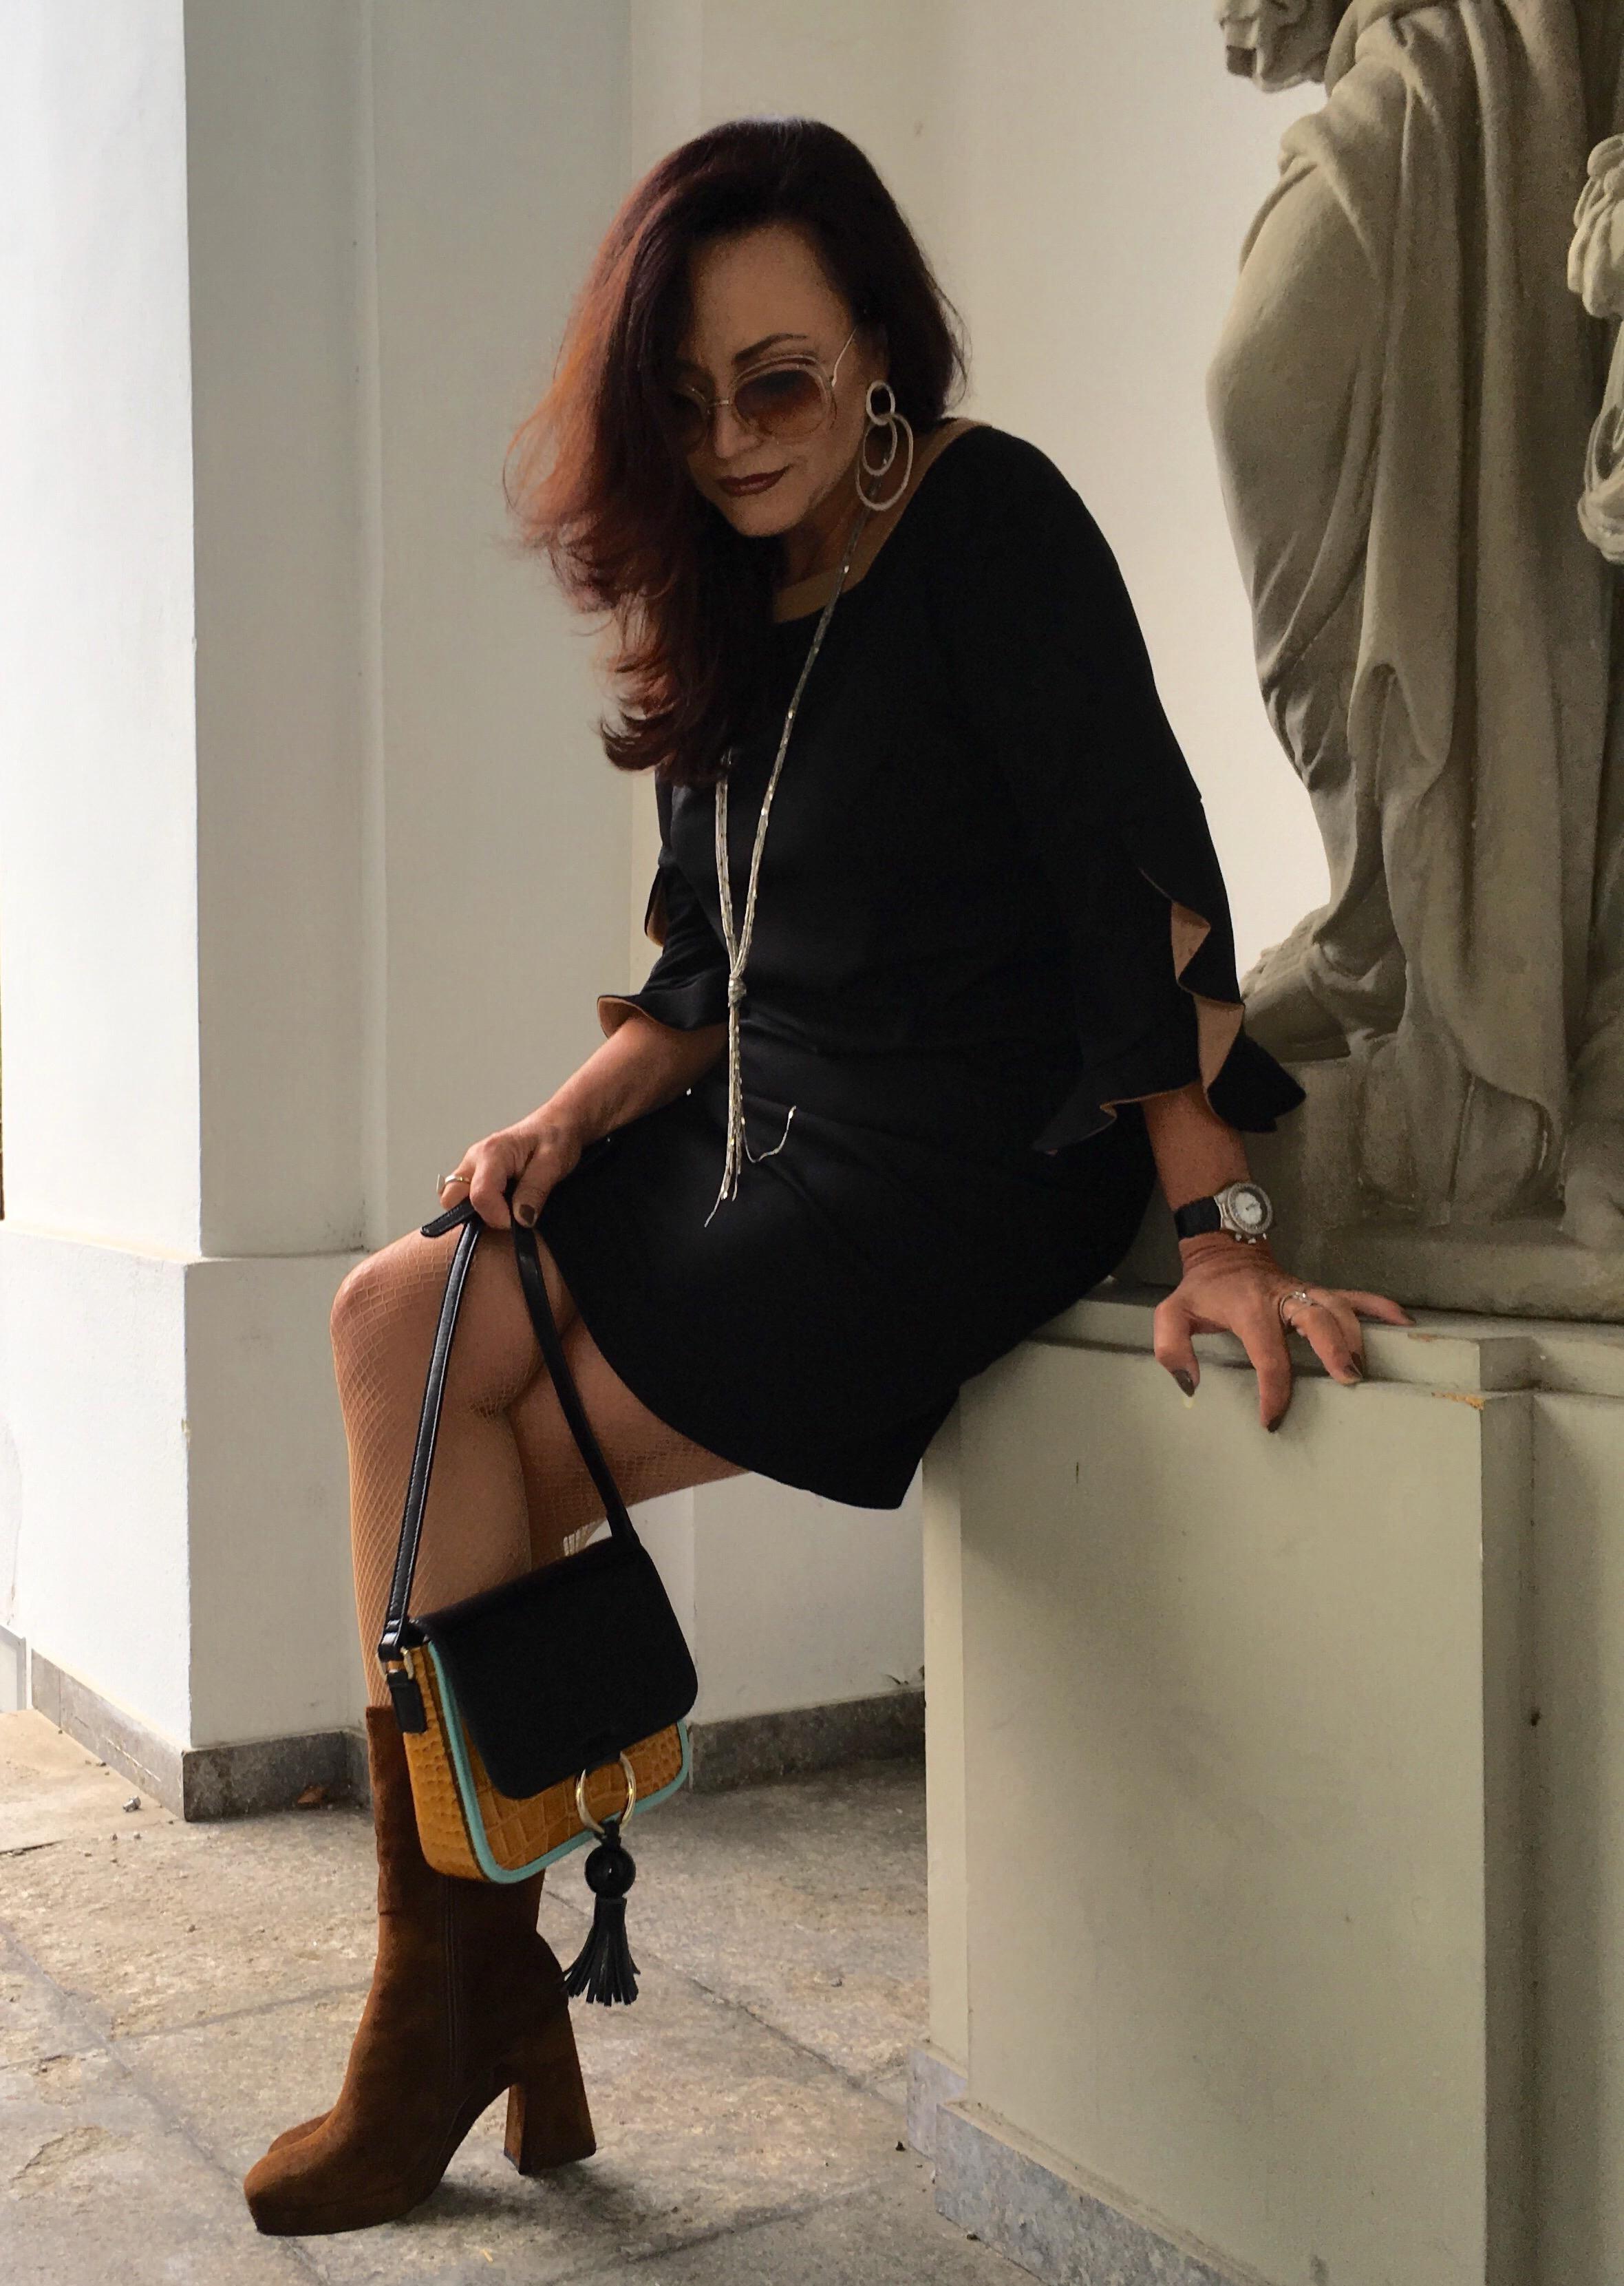 Dress: Sandro Ferrone, Schuhe Rizzolli, style, fashion, Fashionblog, modepost